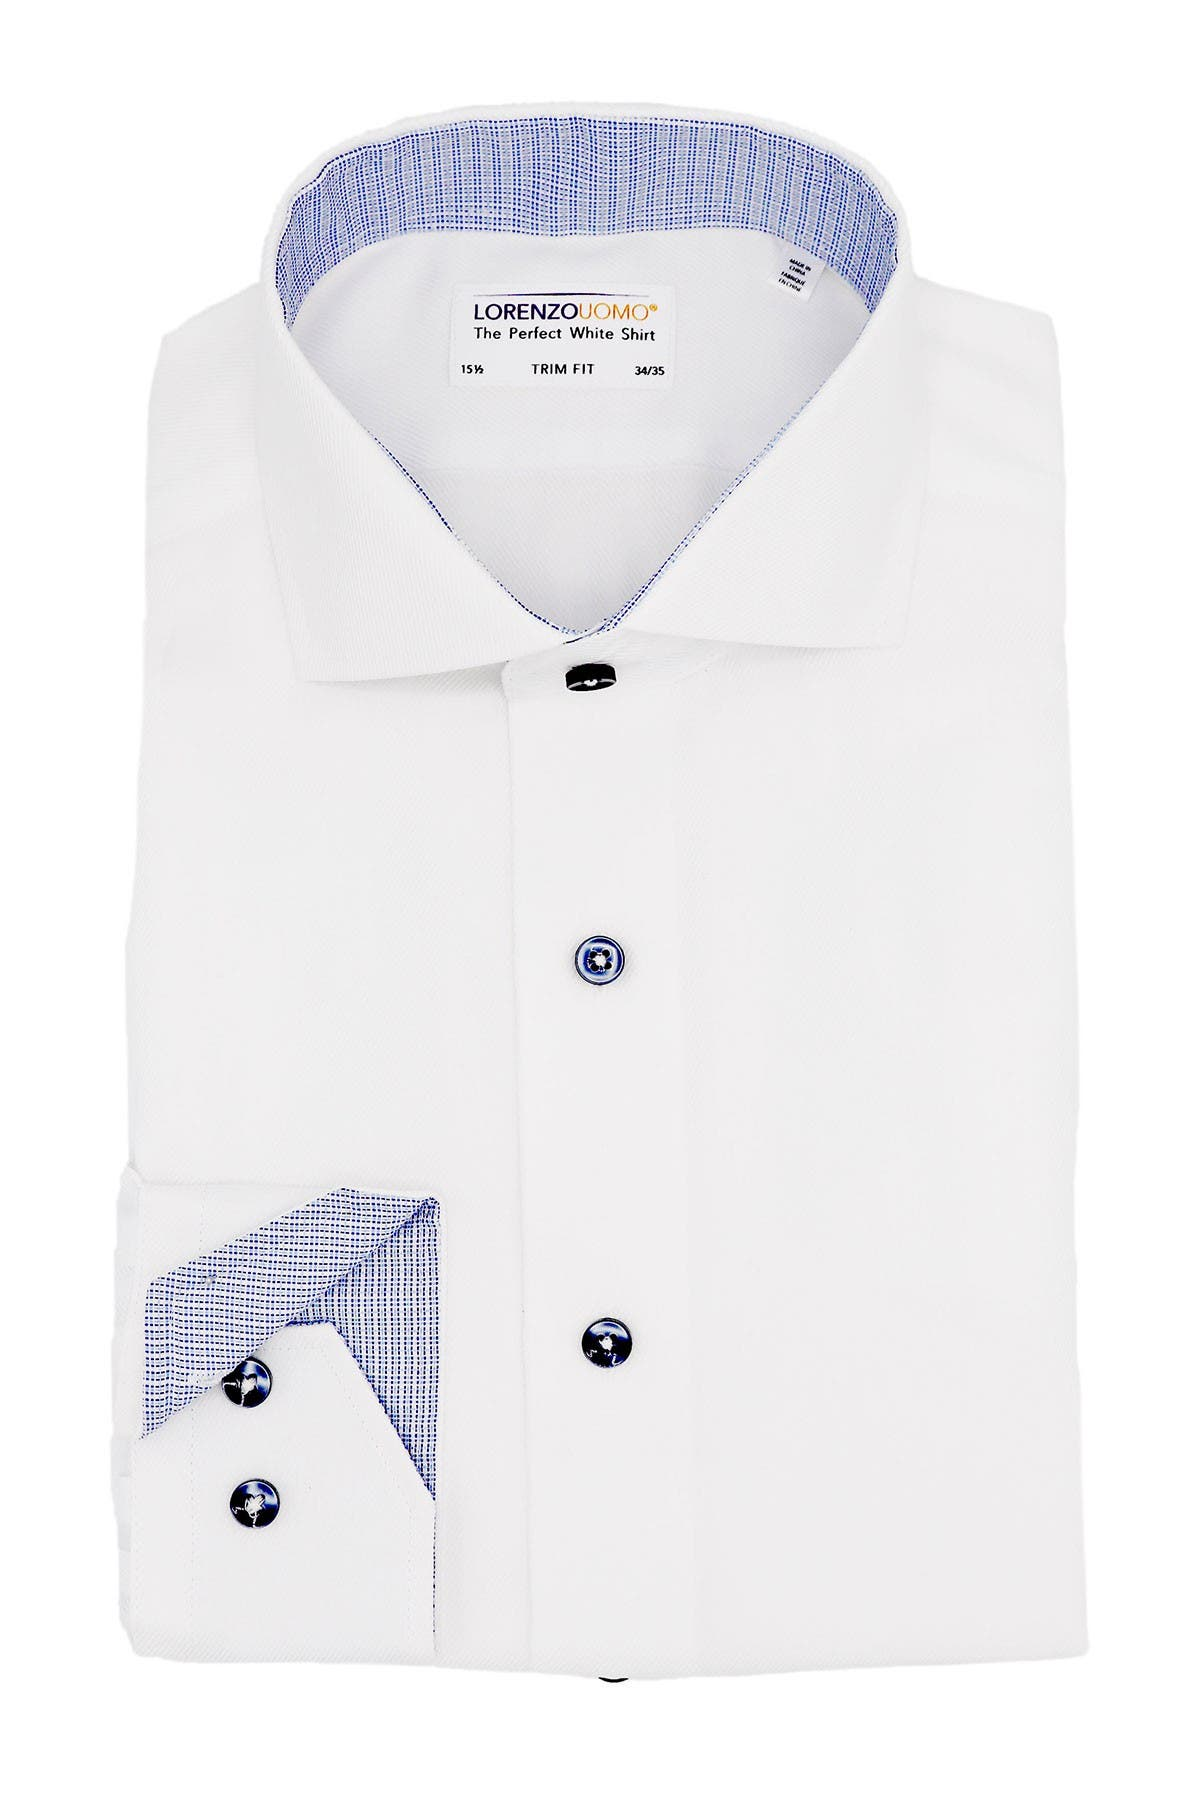 Image of Lorenzo Uomo Solid Diagonal Twill Non-Iron Trim Fit Dress Shirt